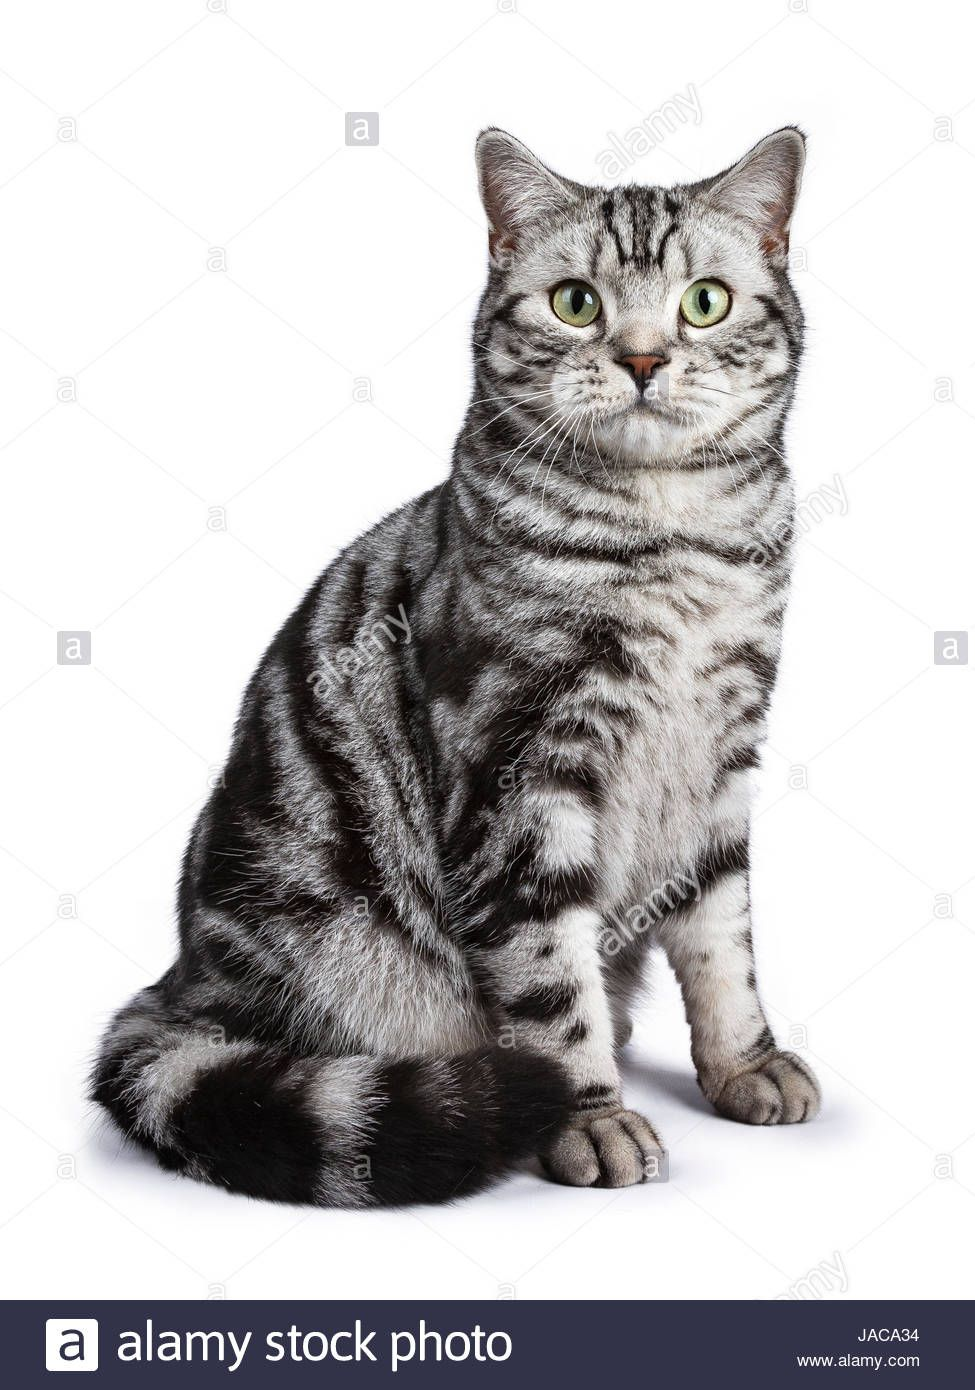 Black Tabby British Shorthair Cat British Shorthair Cats British Shorthair Tabby